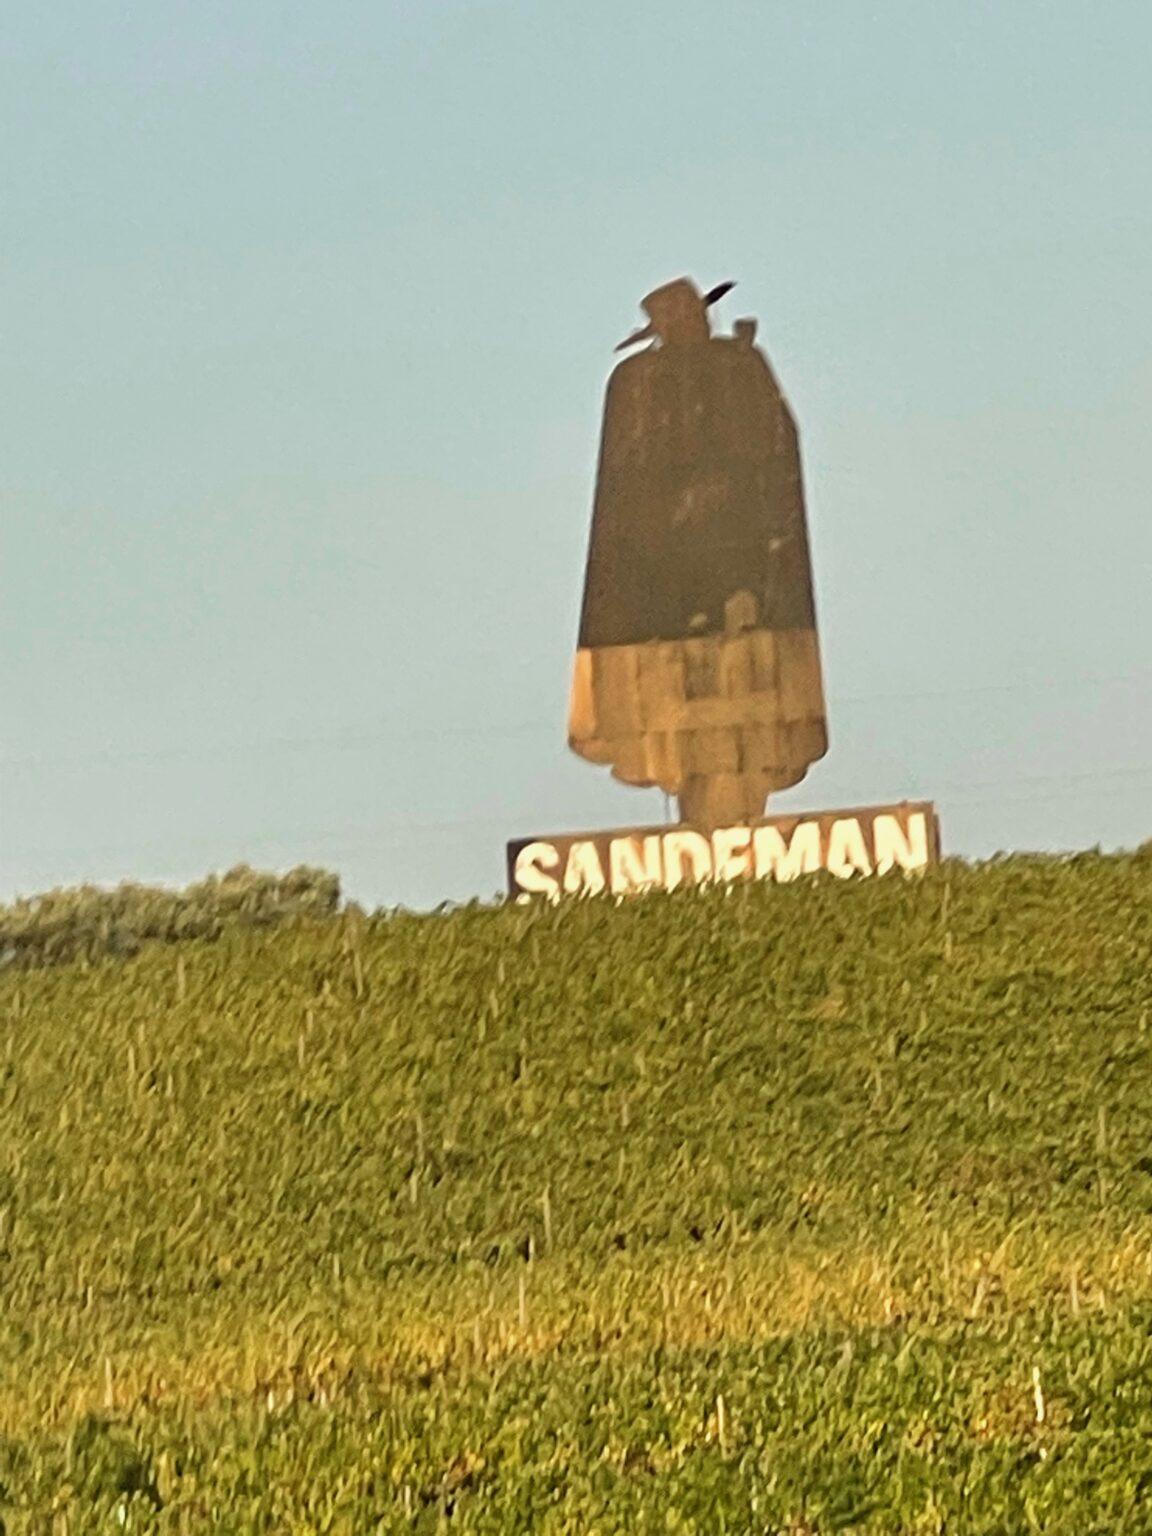 Mr Sandeman in Regua, Portugal.